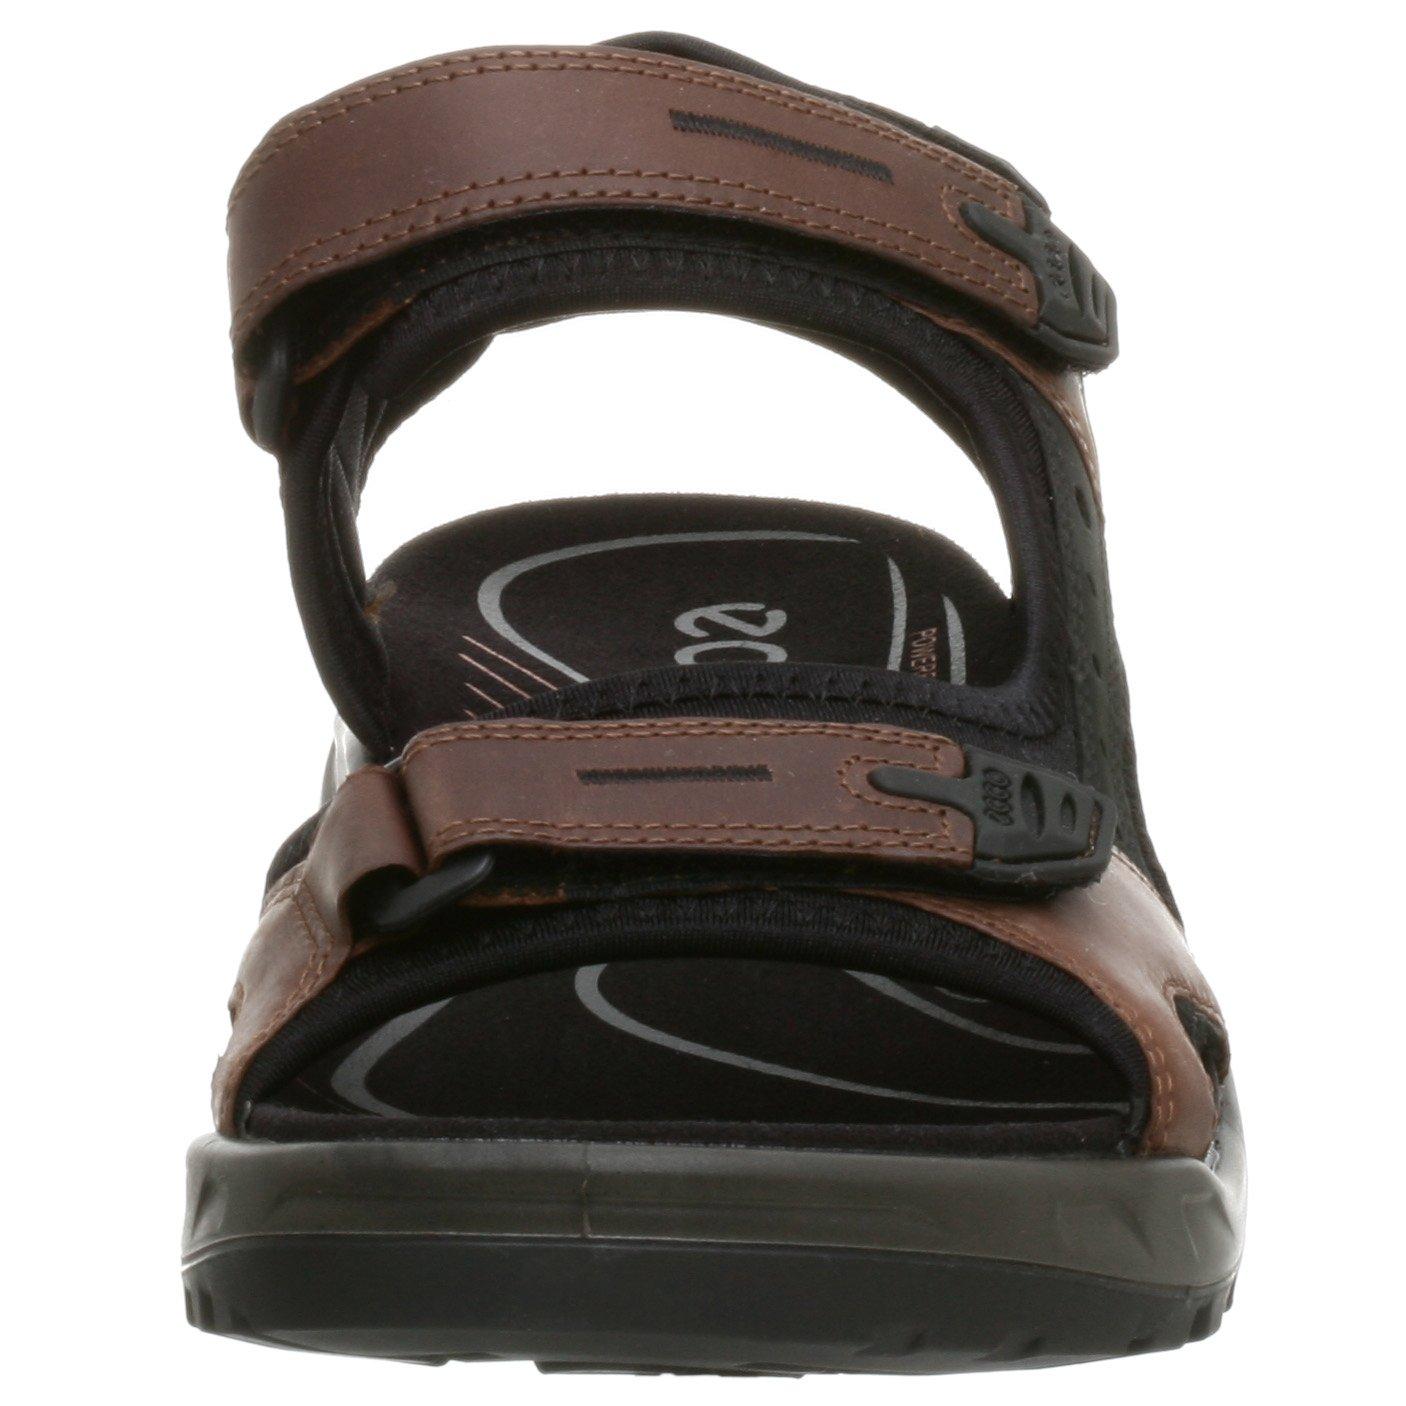 ECCO Men's Yucatan Sandal,Bison/Black/Black,44 EU (US Men's 10-10.5 M) by ECCO (Image #4)